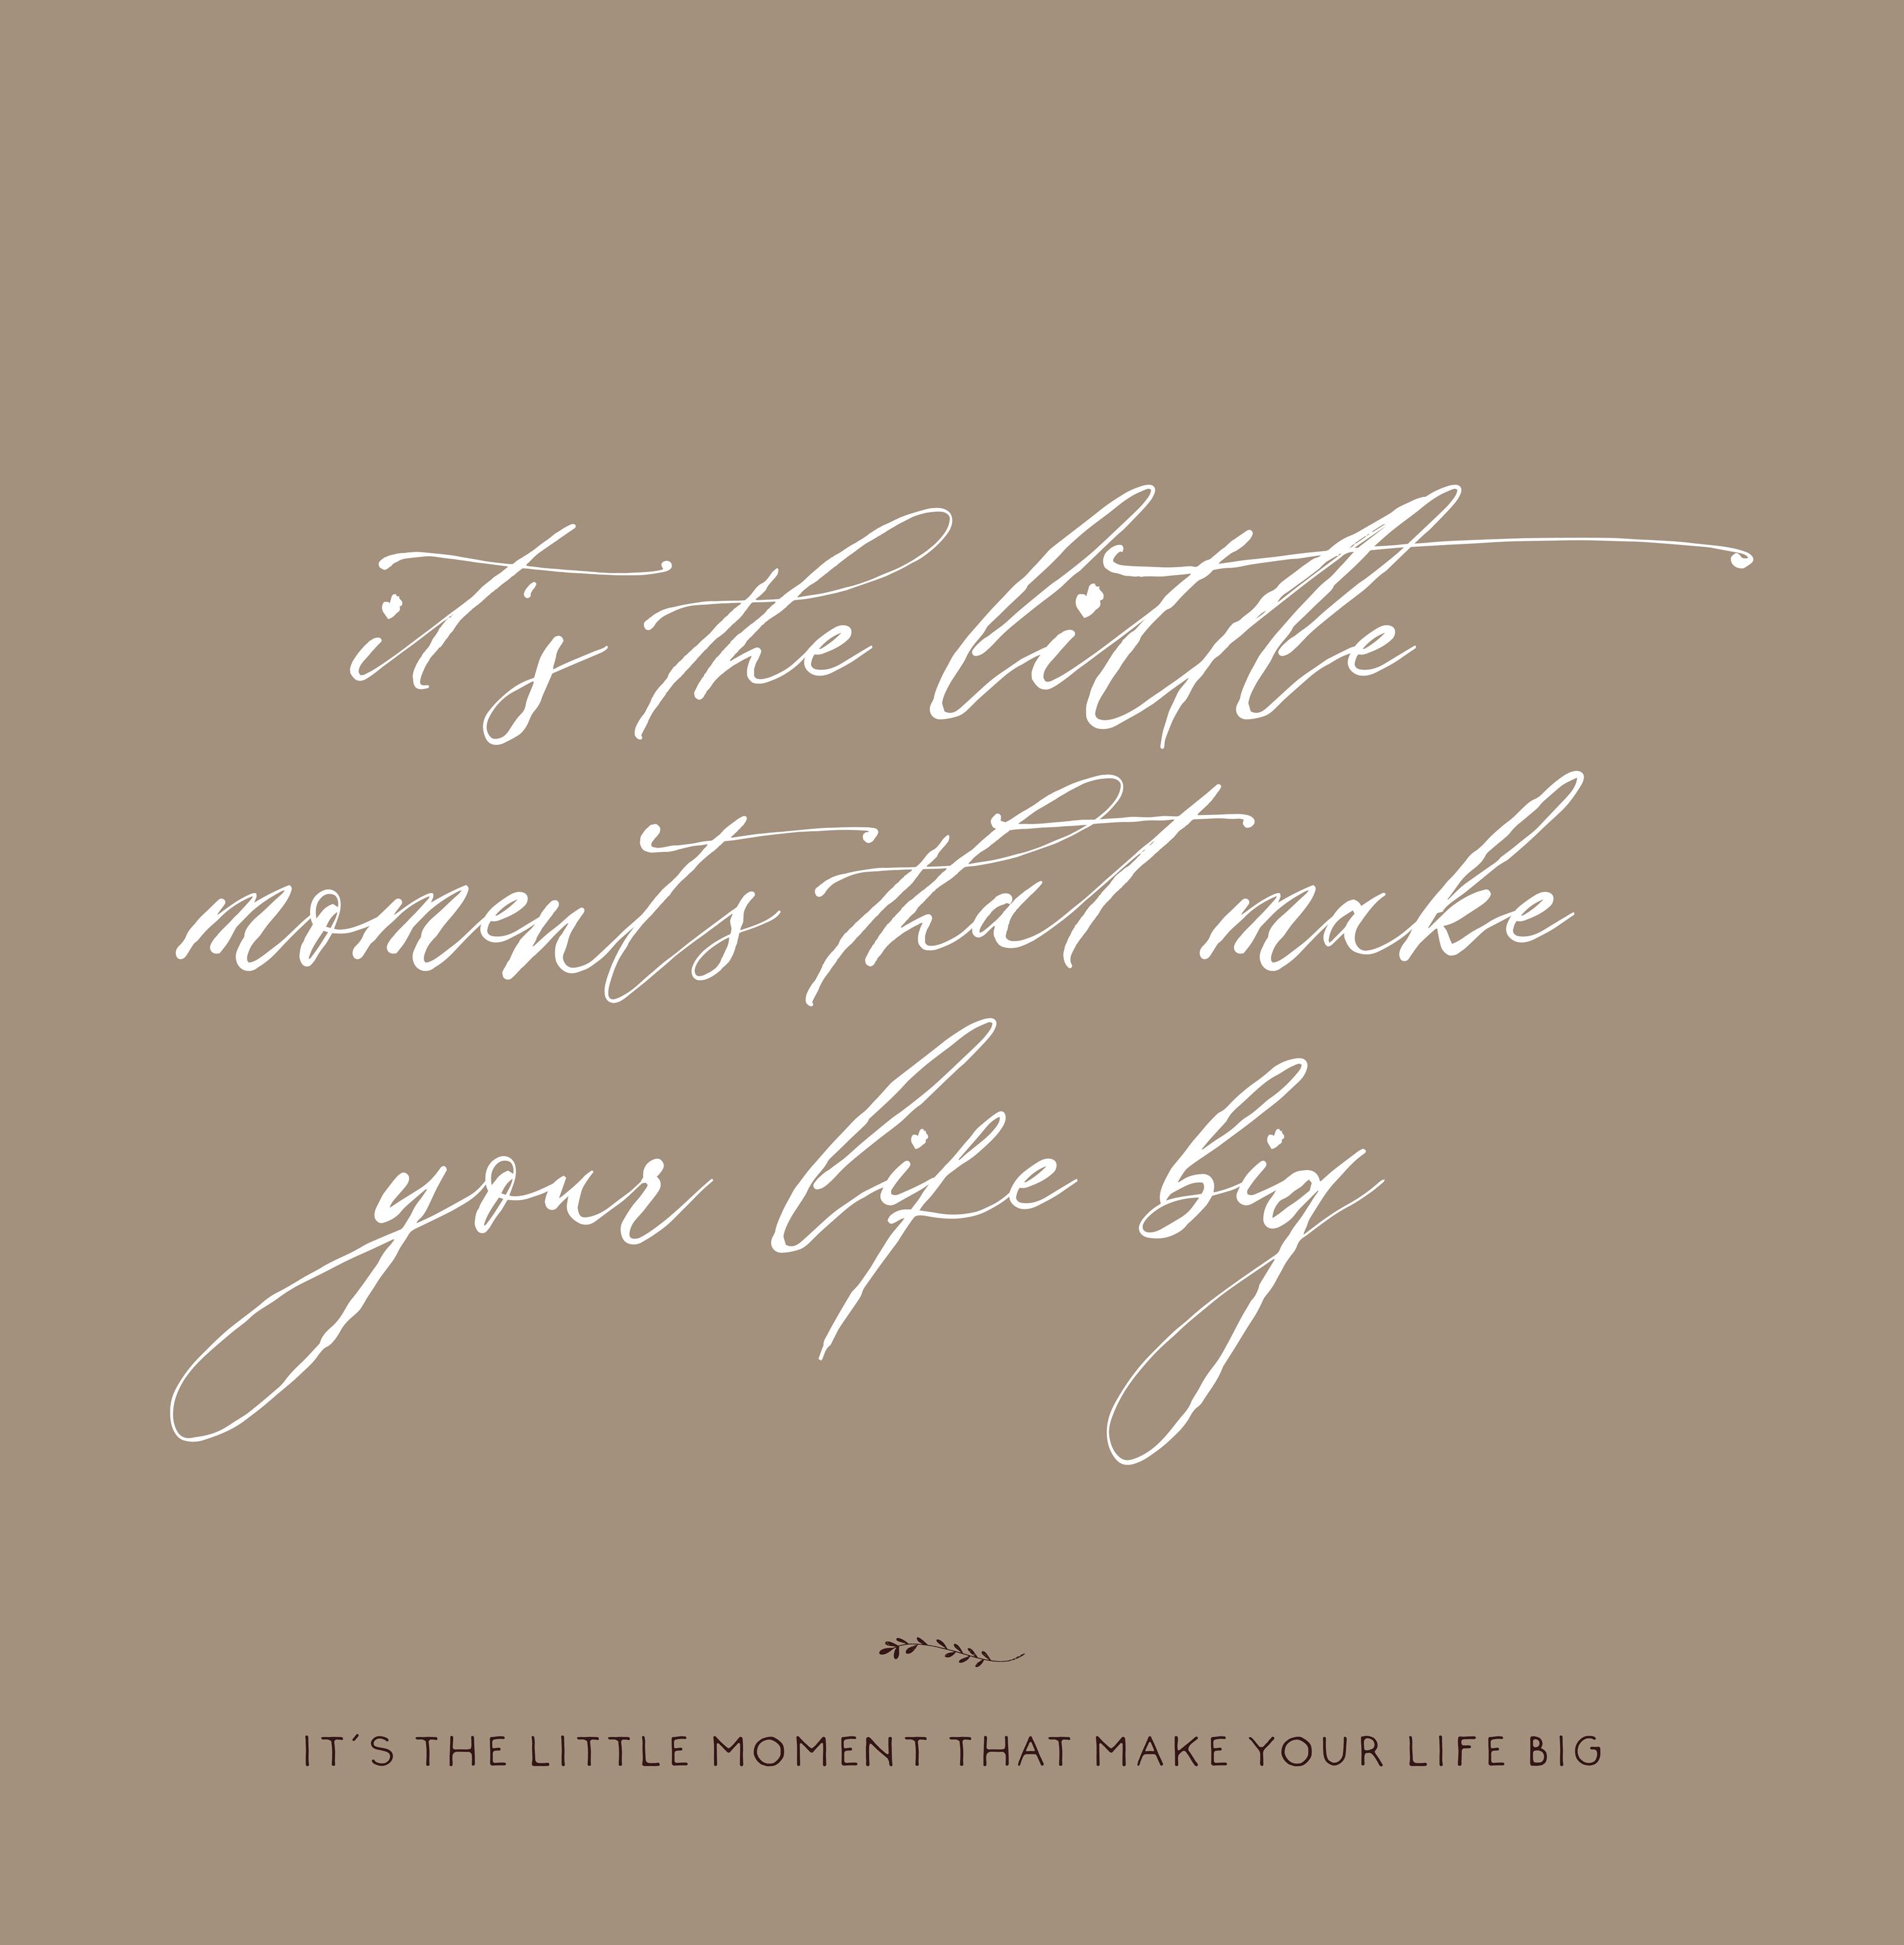 Quotes-Lifestyle-7